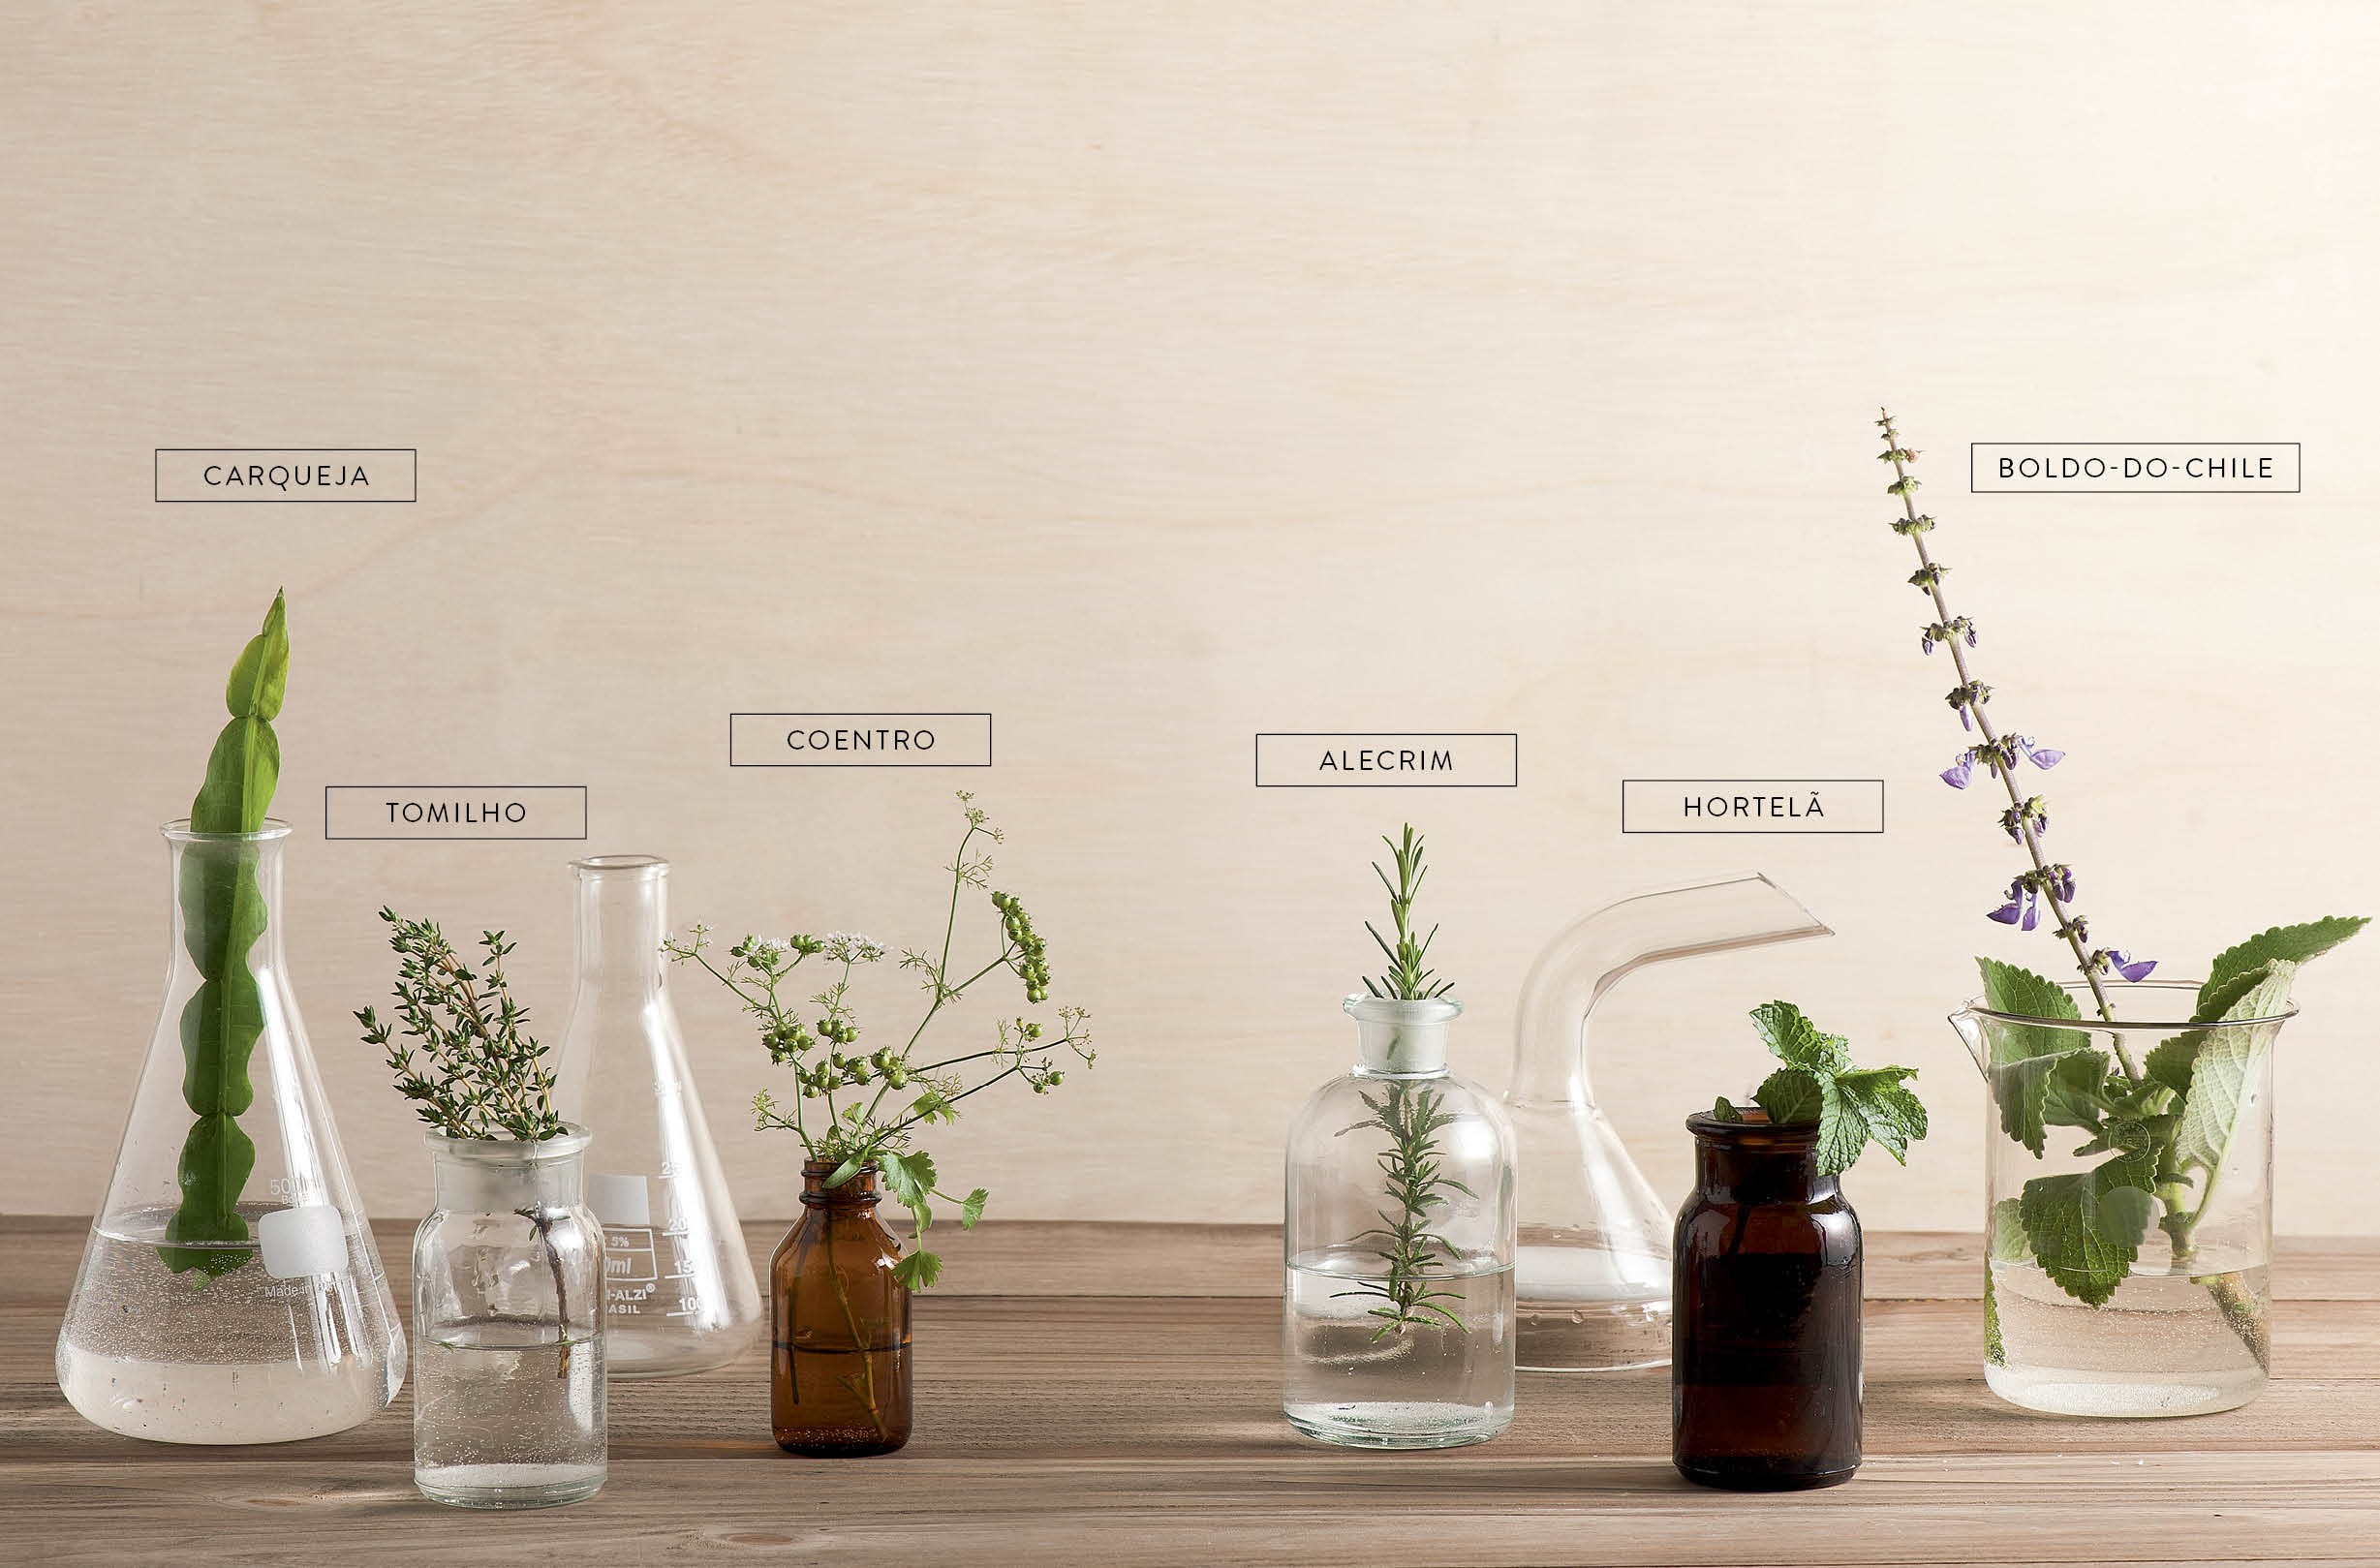 Paisagismo - plantas medicinais (Foto: Iara Venanzi / Editora Globo)